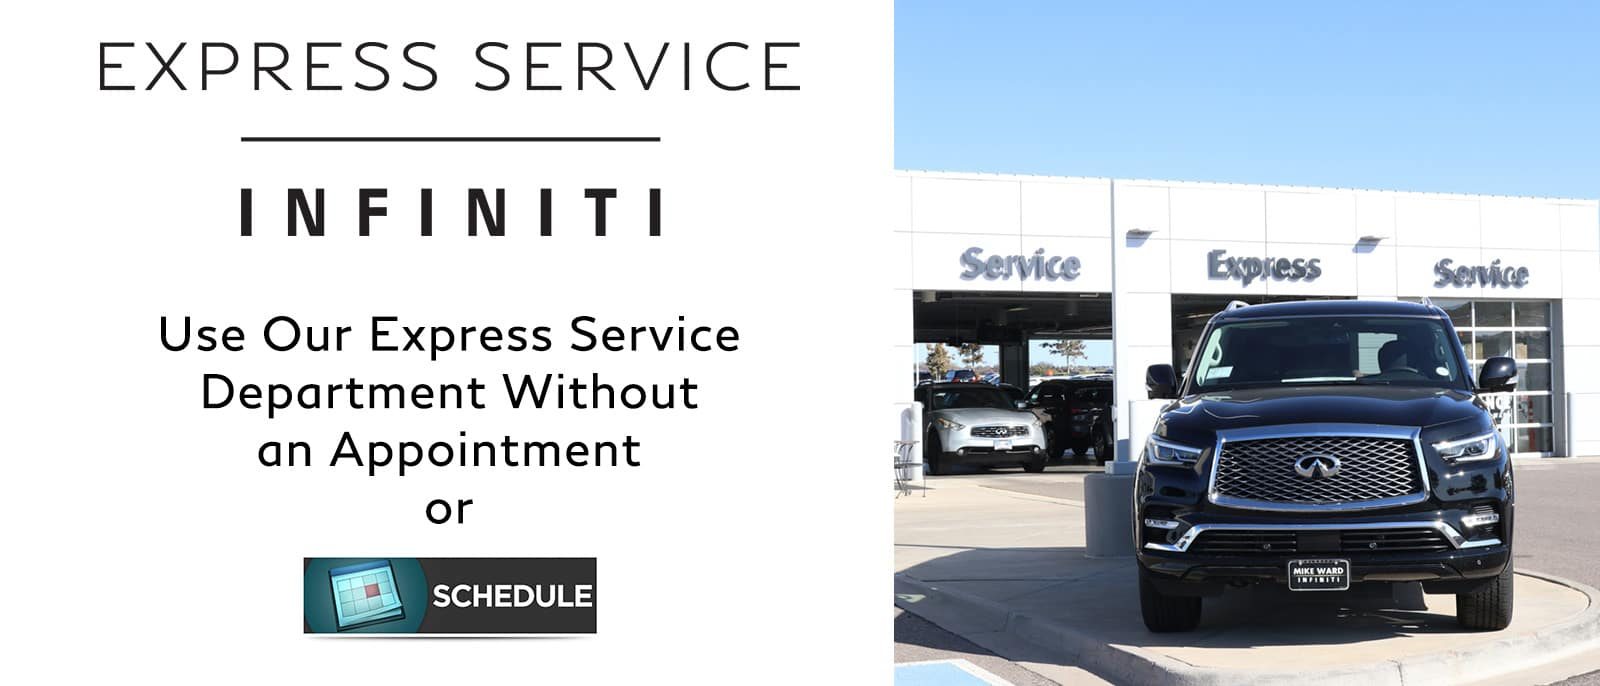 INFINITI Express Service